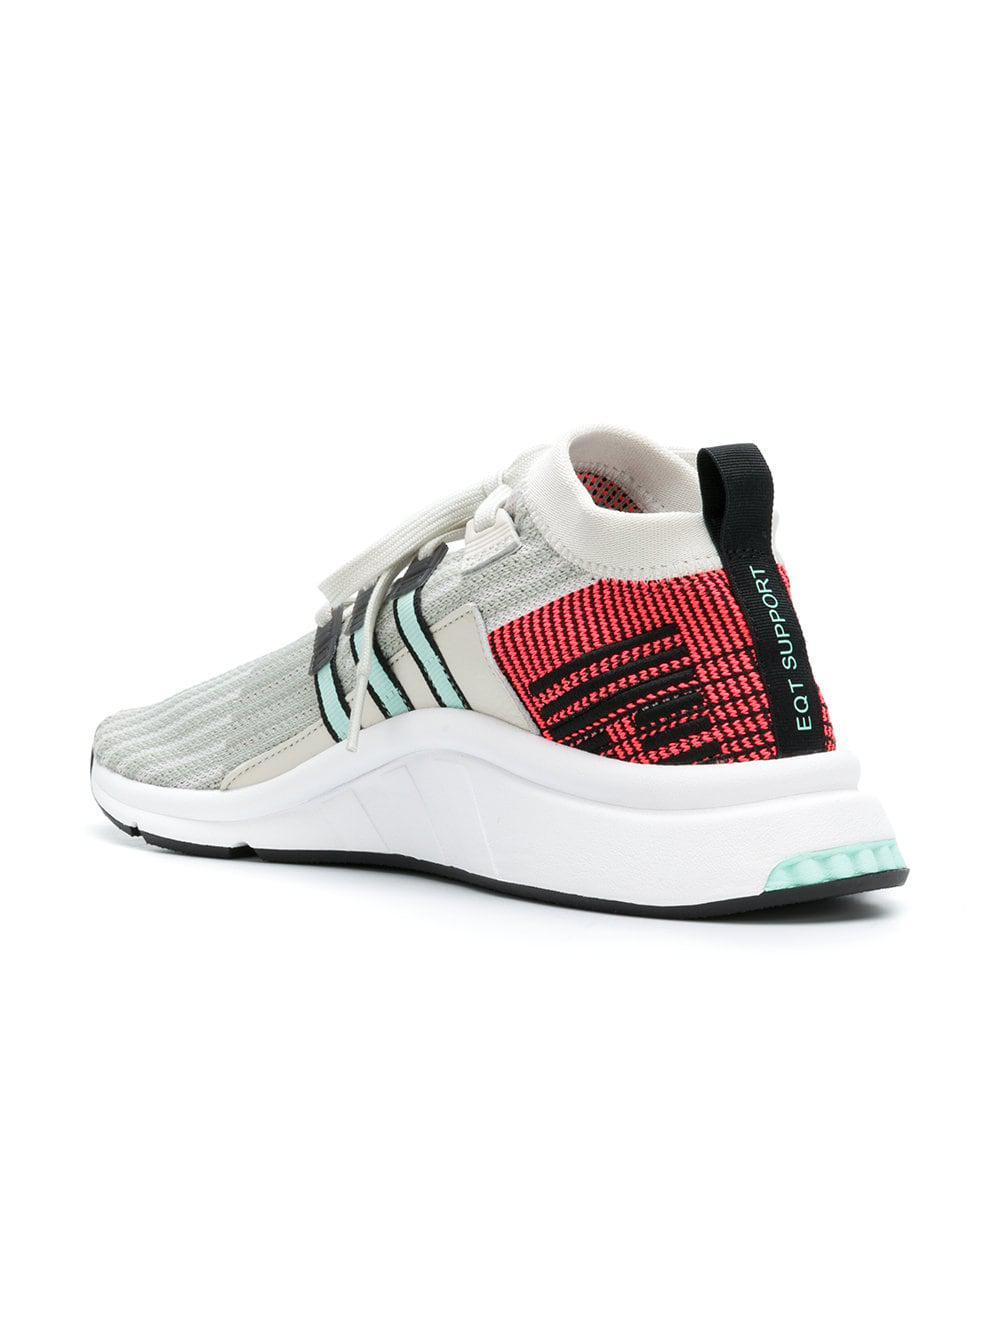 dd0d42f5dd7016 Adidas - Multicolor Eqt Support Mid Adv Sneakers for Men - Lyst. View  fullscreen